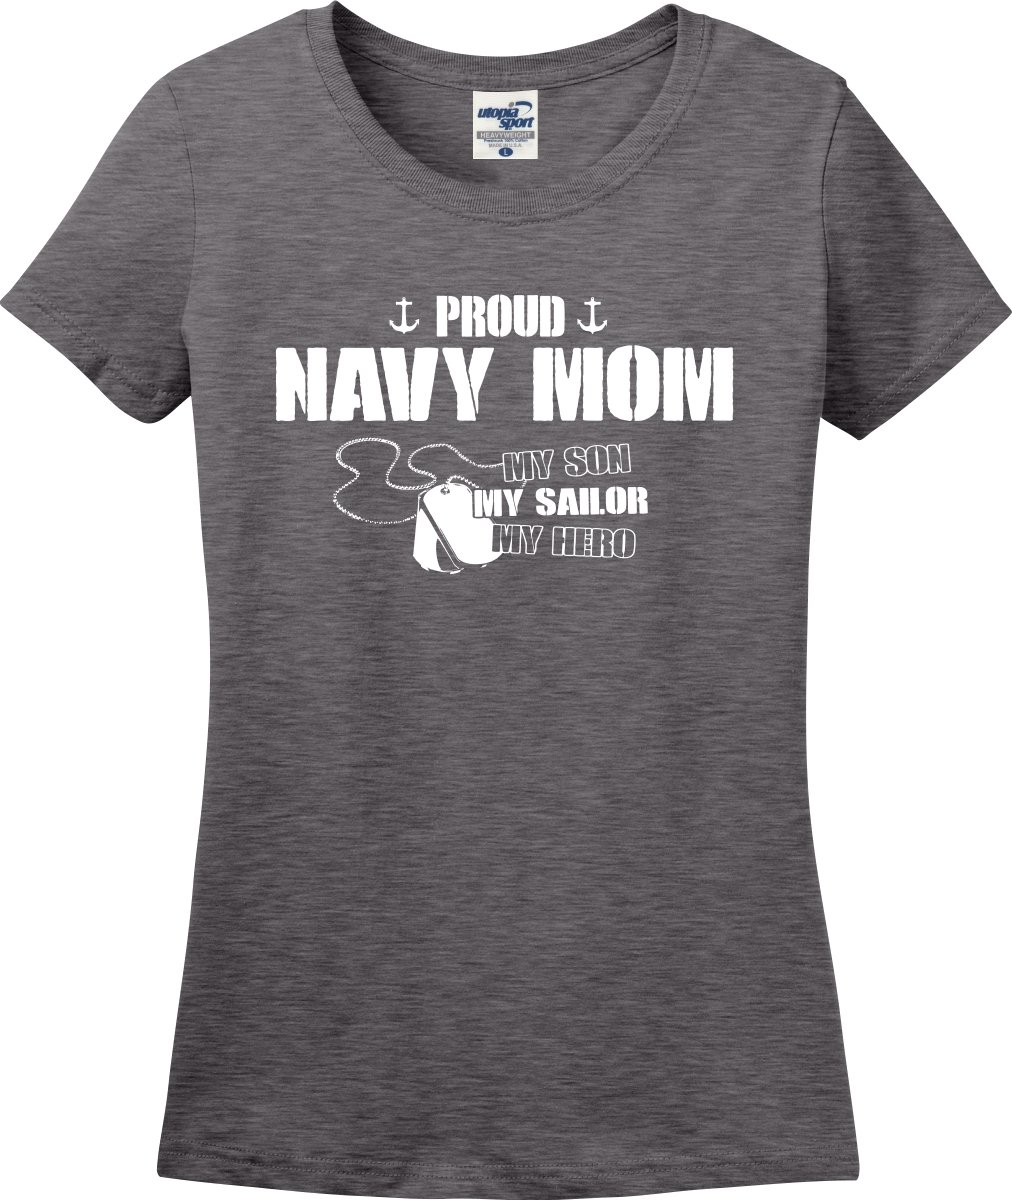 Utopia Sport Proud Navy Mom My Son Sailor Hero Ladies T-Shirt (S-3X) (Medium, Graphite Heather)